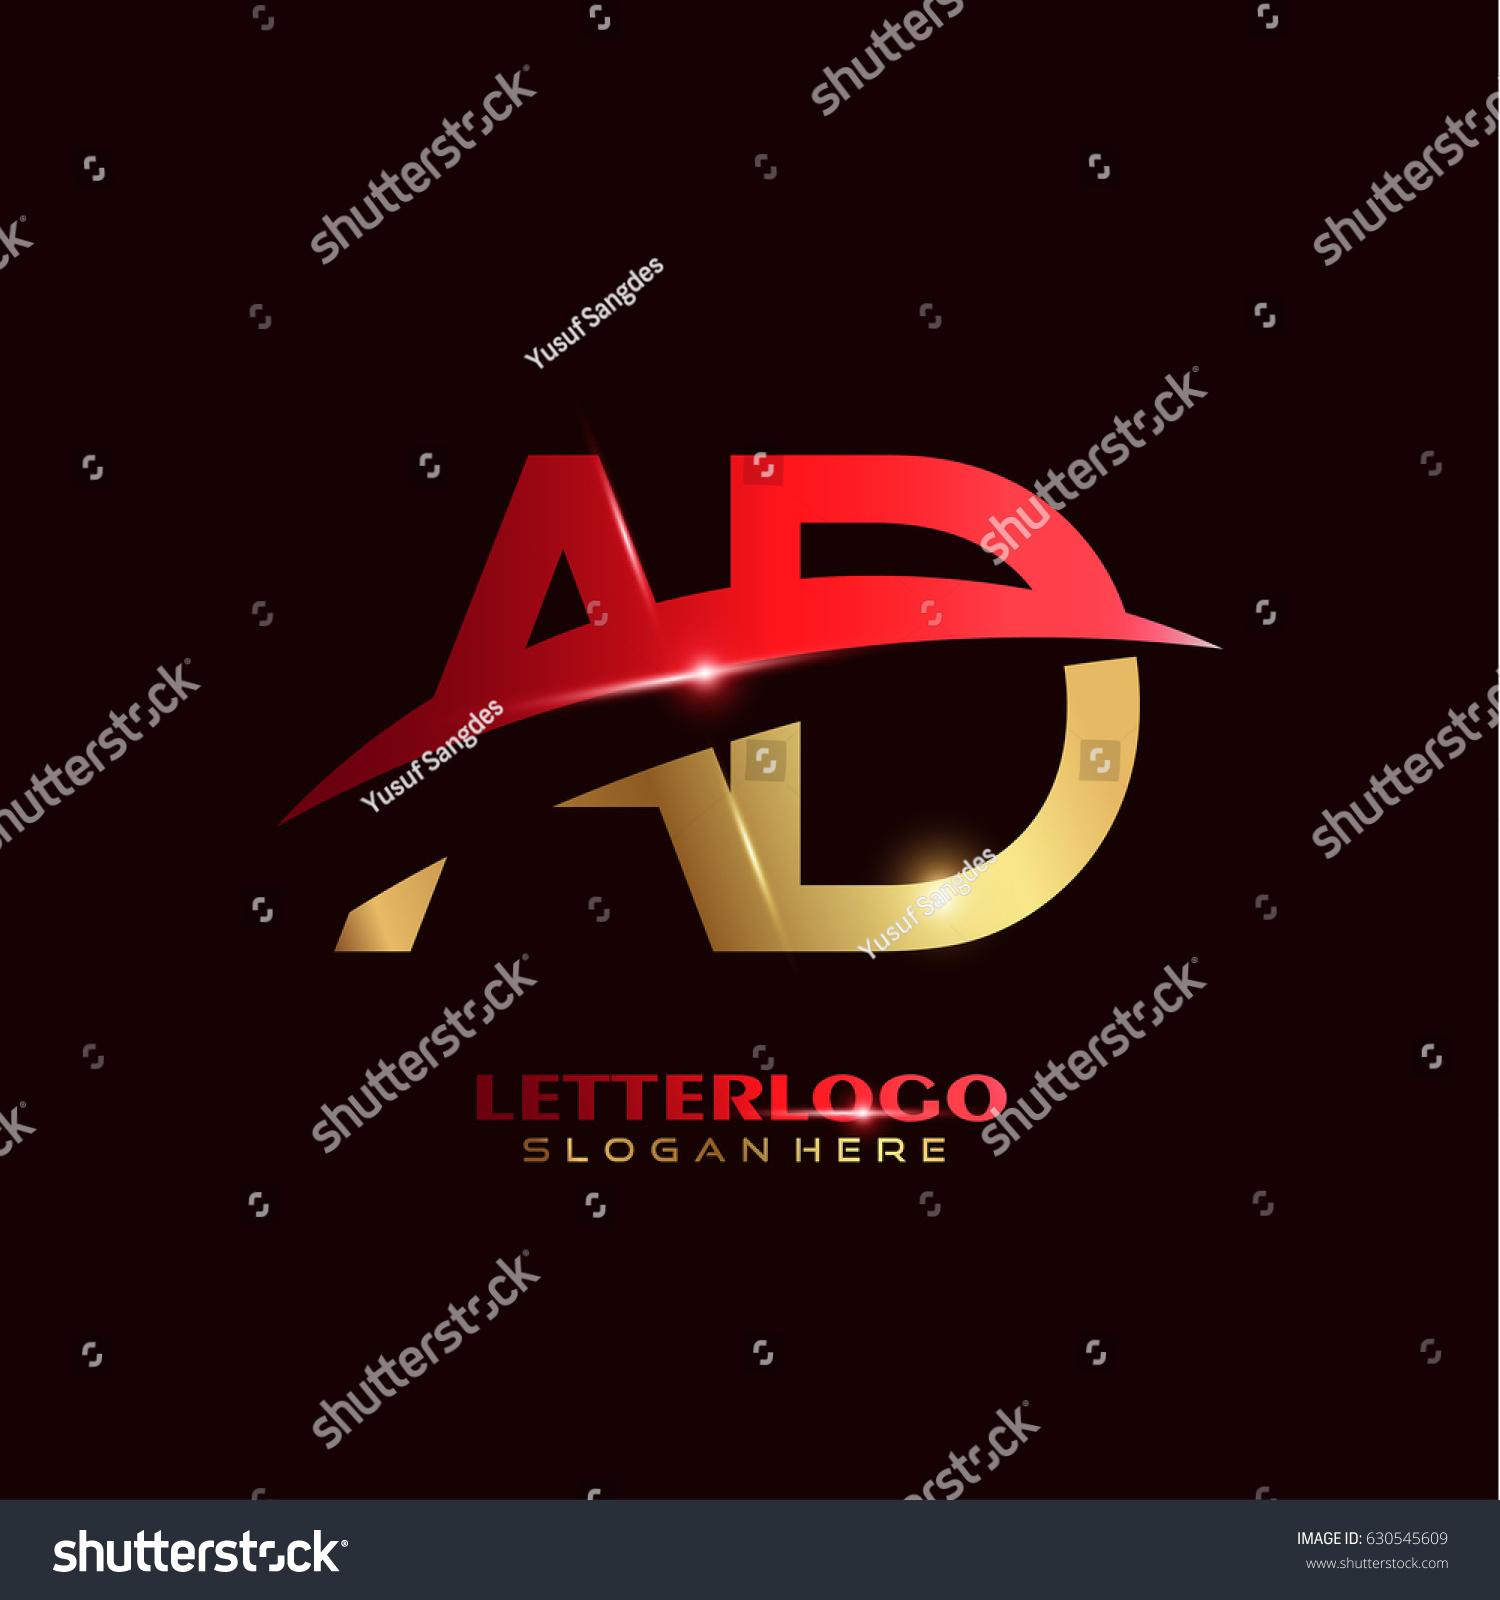 AD Logo Vector Initial Letter Logo Stock Vector 630545609 - Shutterstock